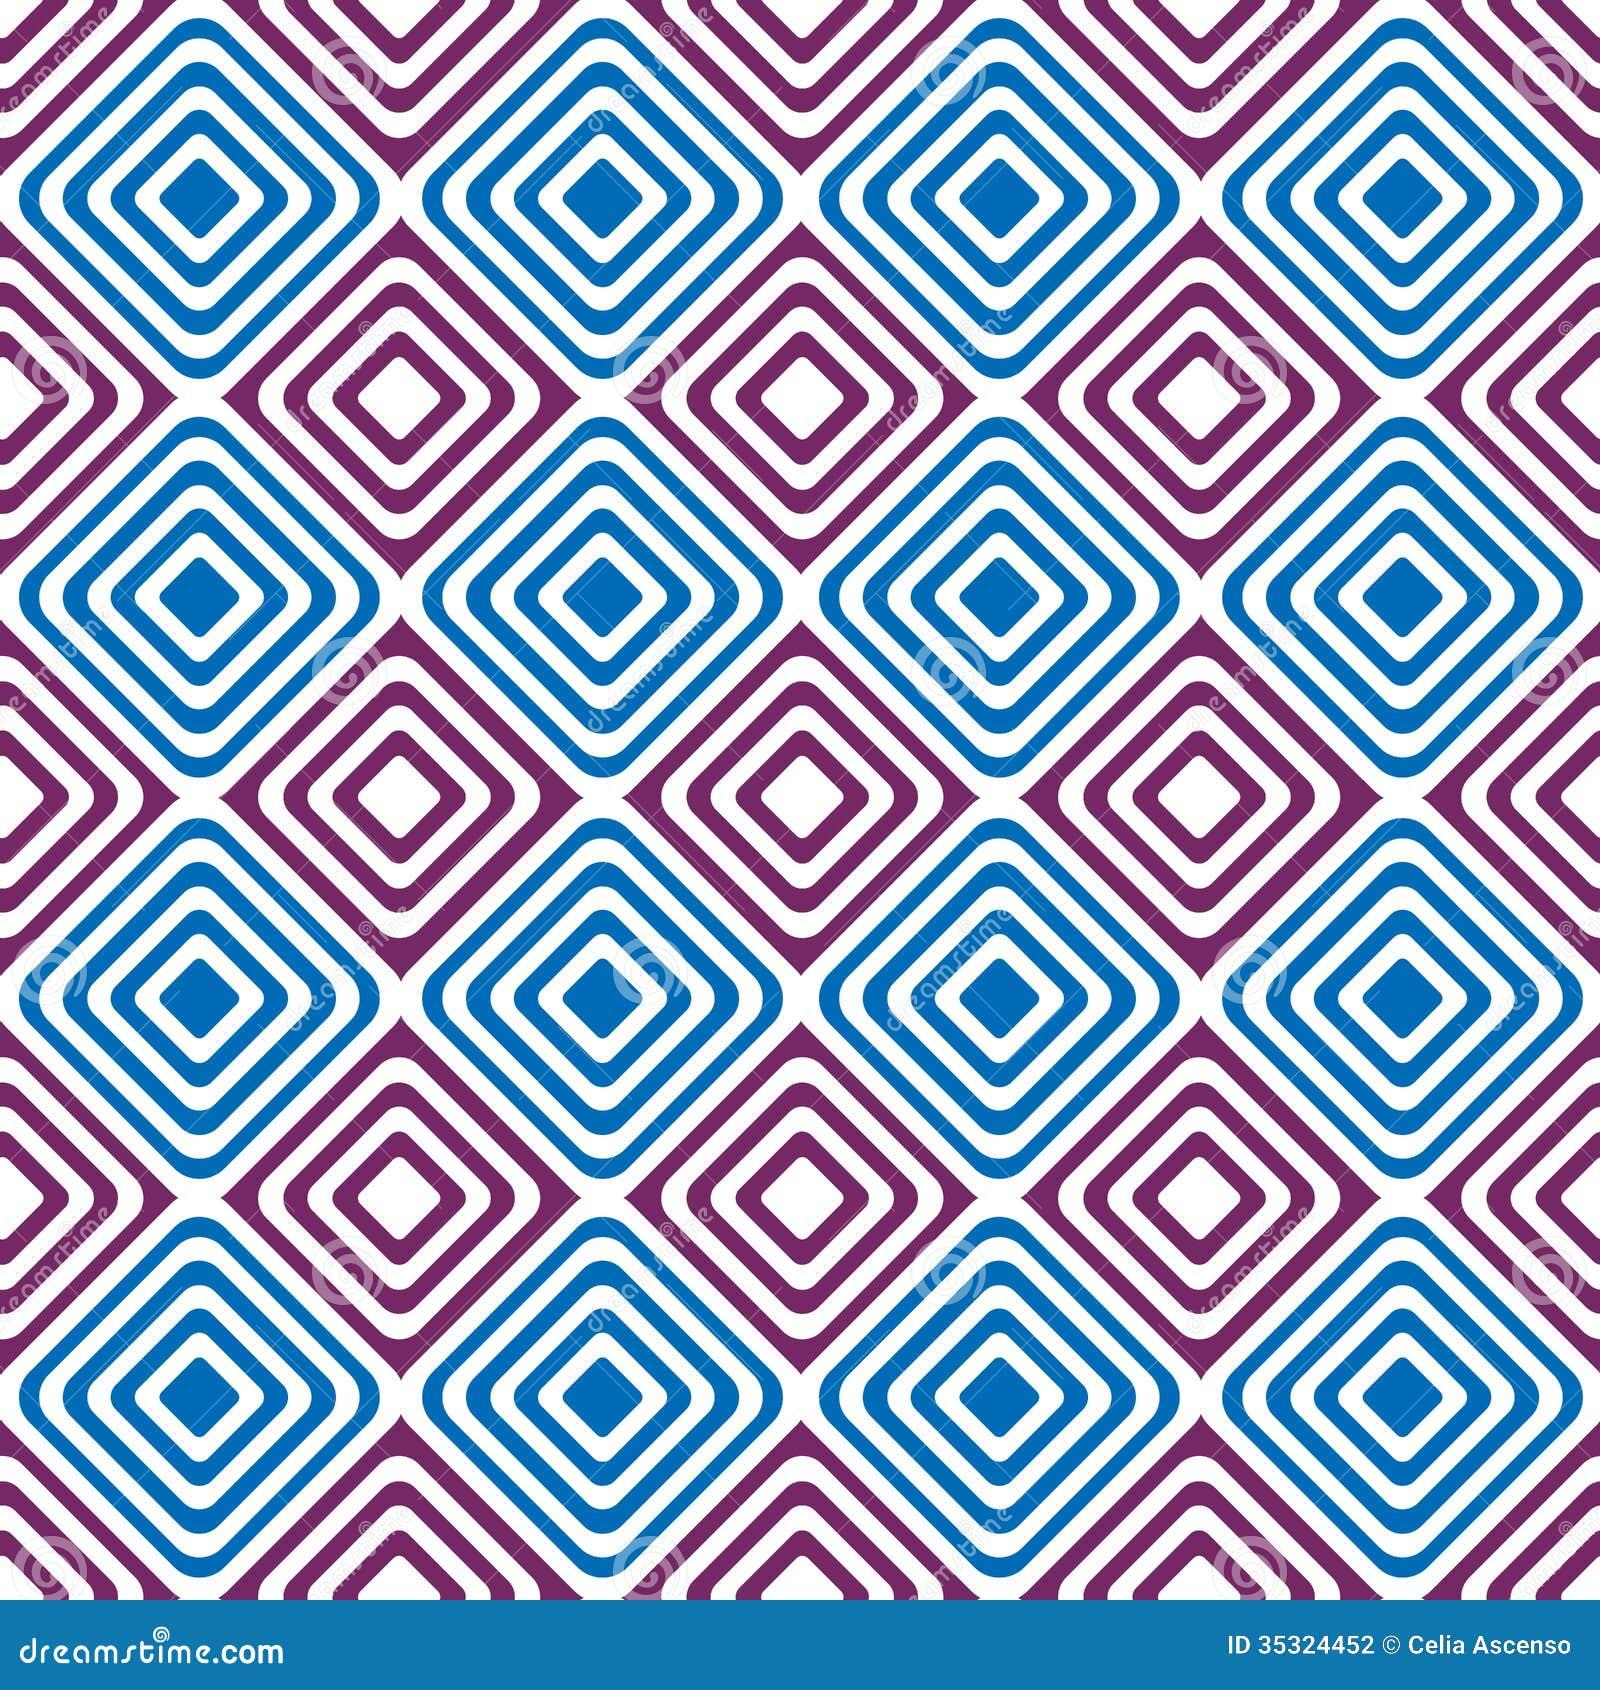 Naadloos diamanten backgound patroon